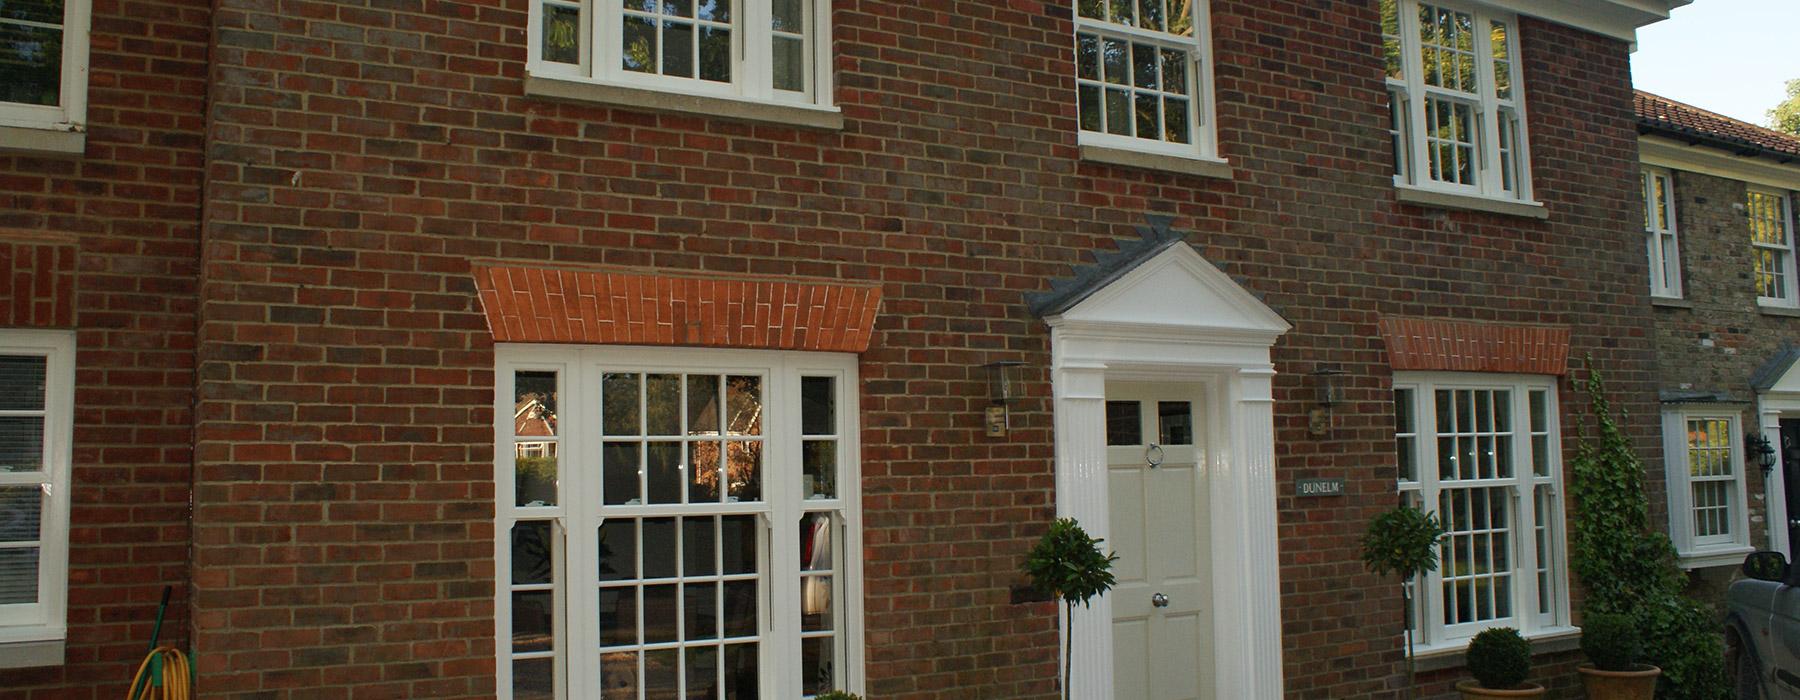 Windows Oxford